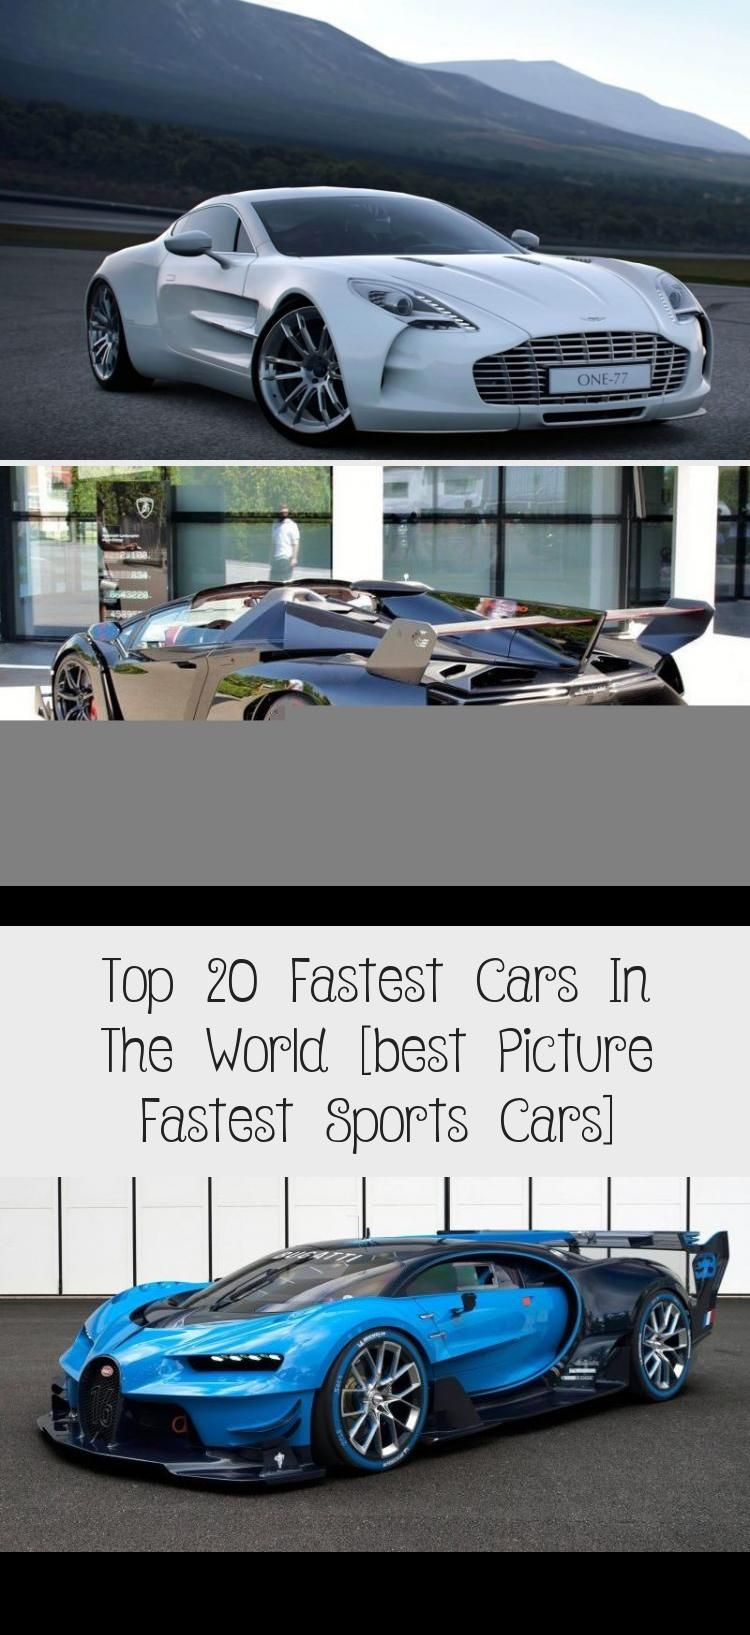 Look At These Sports Cars Classy And Luxurious Car There Are Lamborghini Ferrari Bmw Audi Bugati Etc Sourch Image By Esty Com Coolcar Nicecar Lamborg